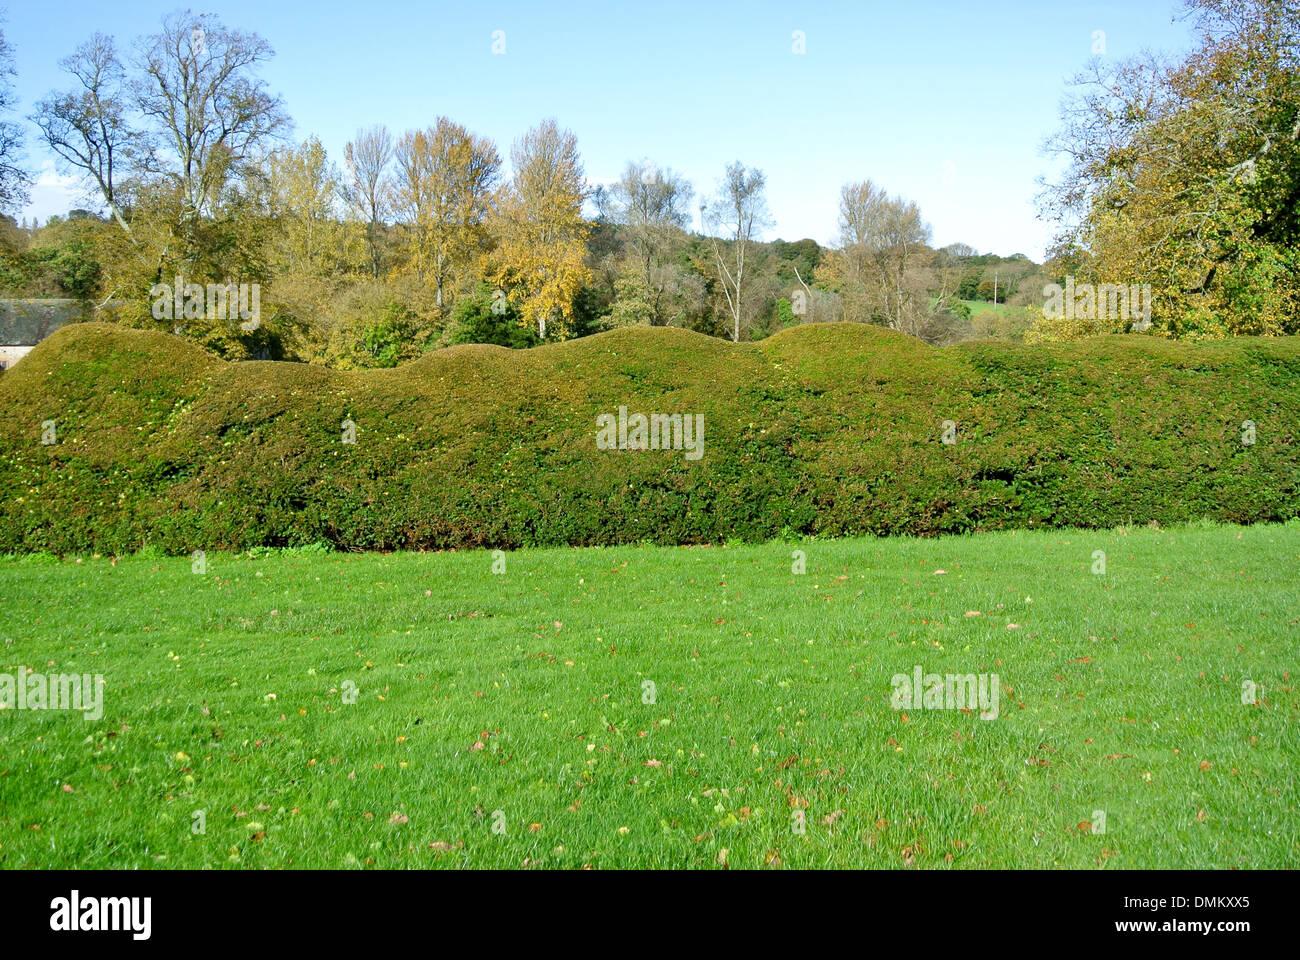 old yew hedge - Stock Image